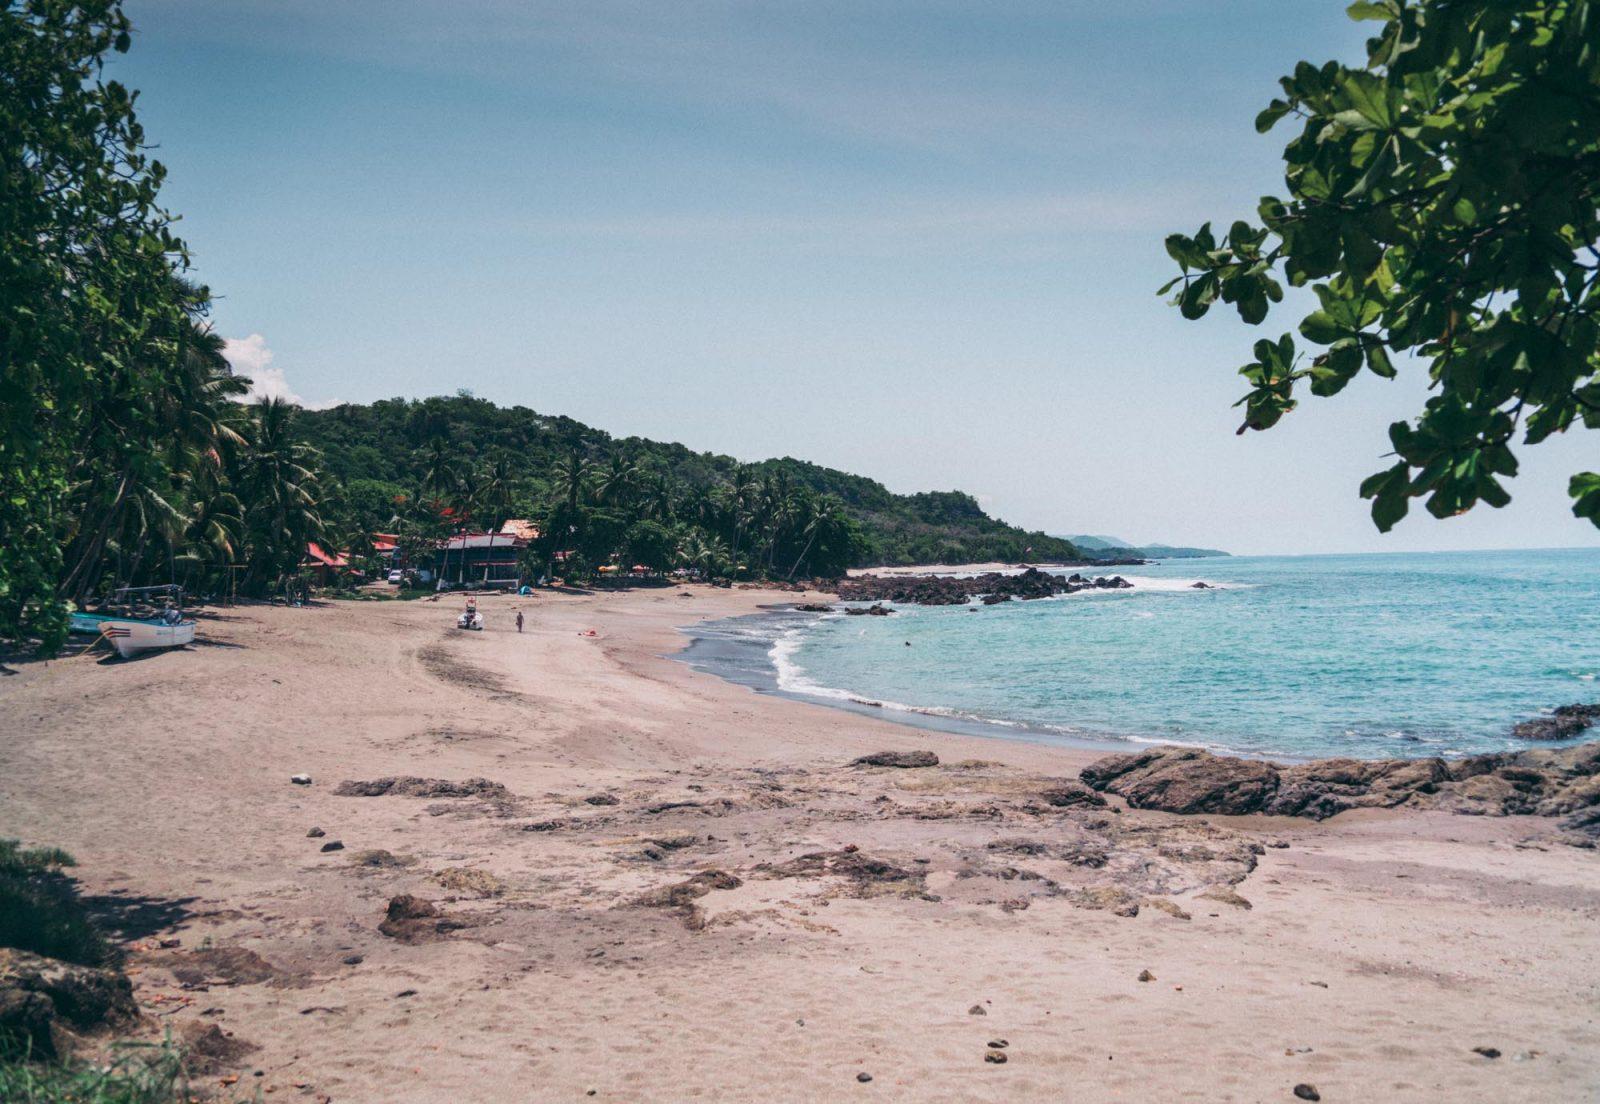 Things to do in Santa Teresa Costa Rica